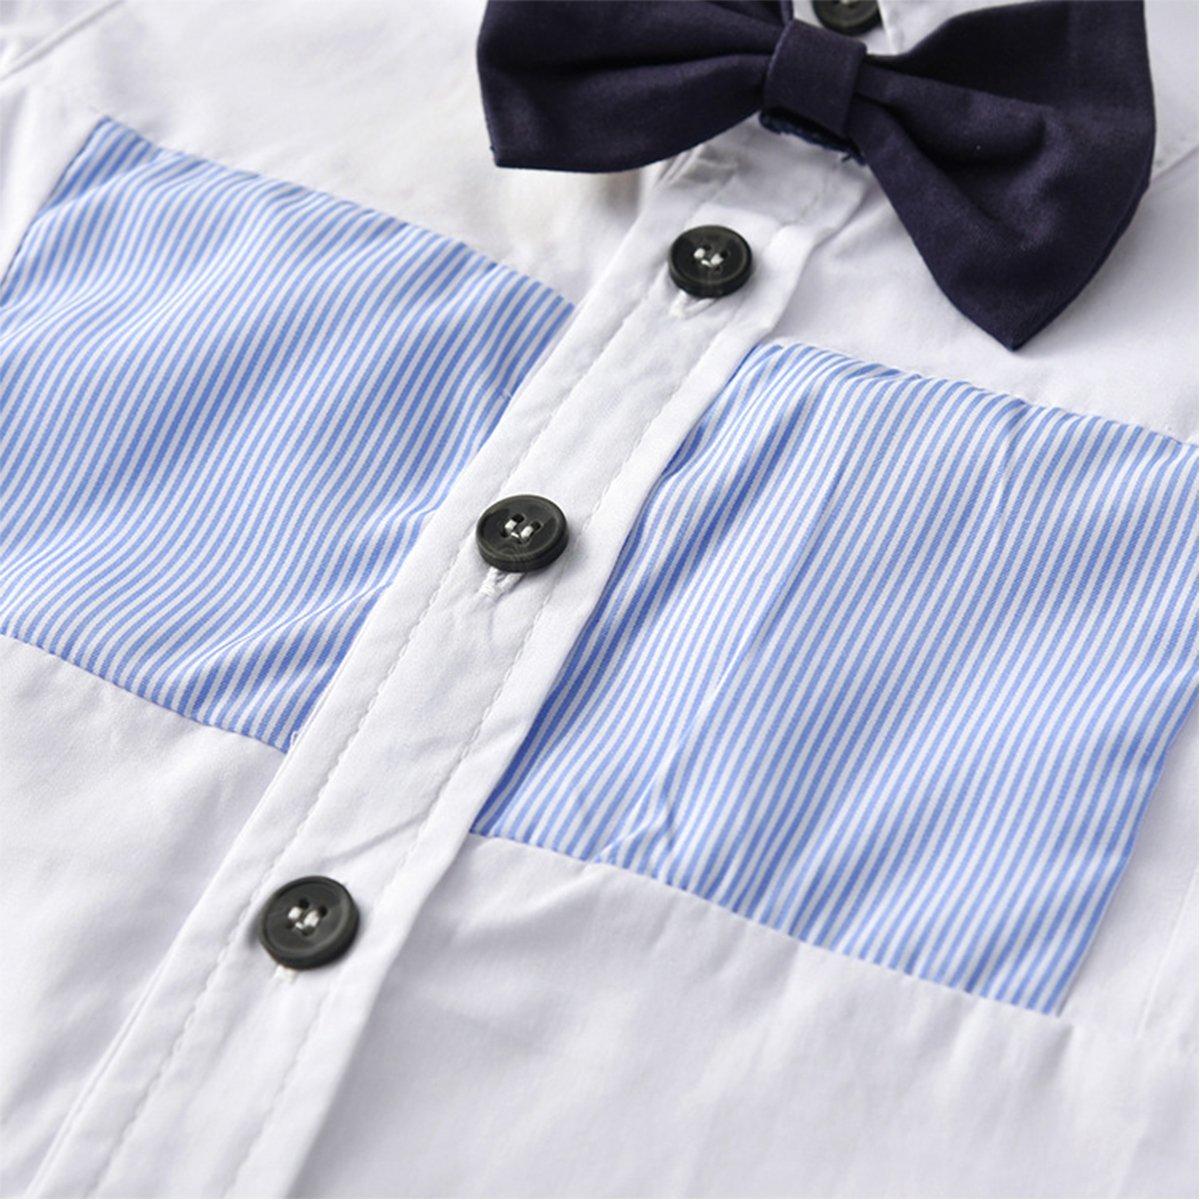 Toddler Kids Boys Gentlemen Suit Long Sleeve Shirt Tops Jeans Pants 2PCS Outfits Set